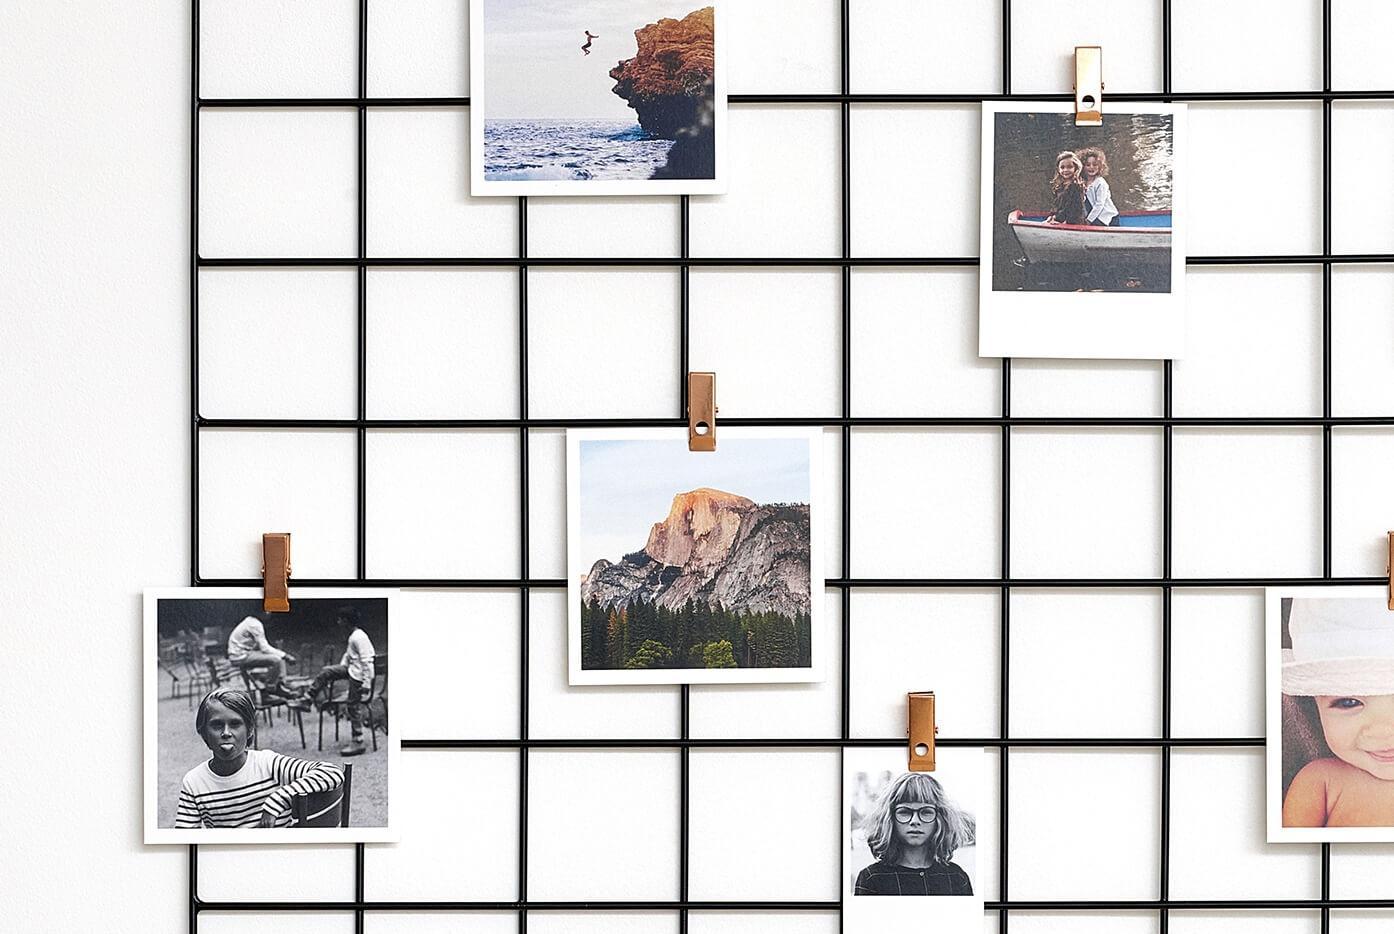 Innocence - Les carres classiques - Tirage photo - Polaroid